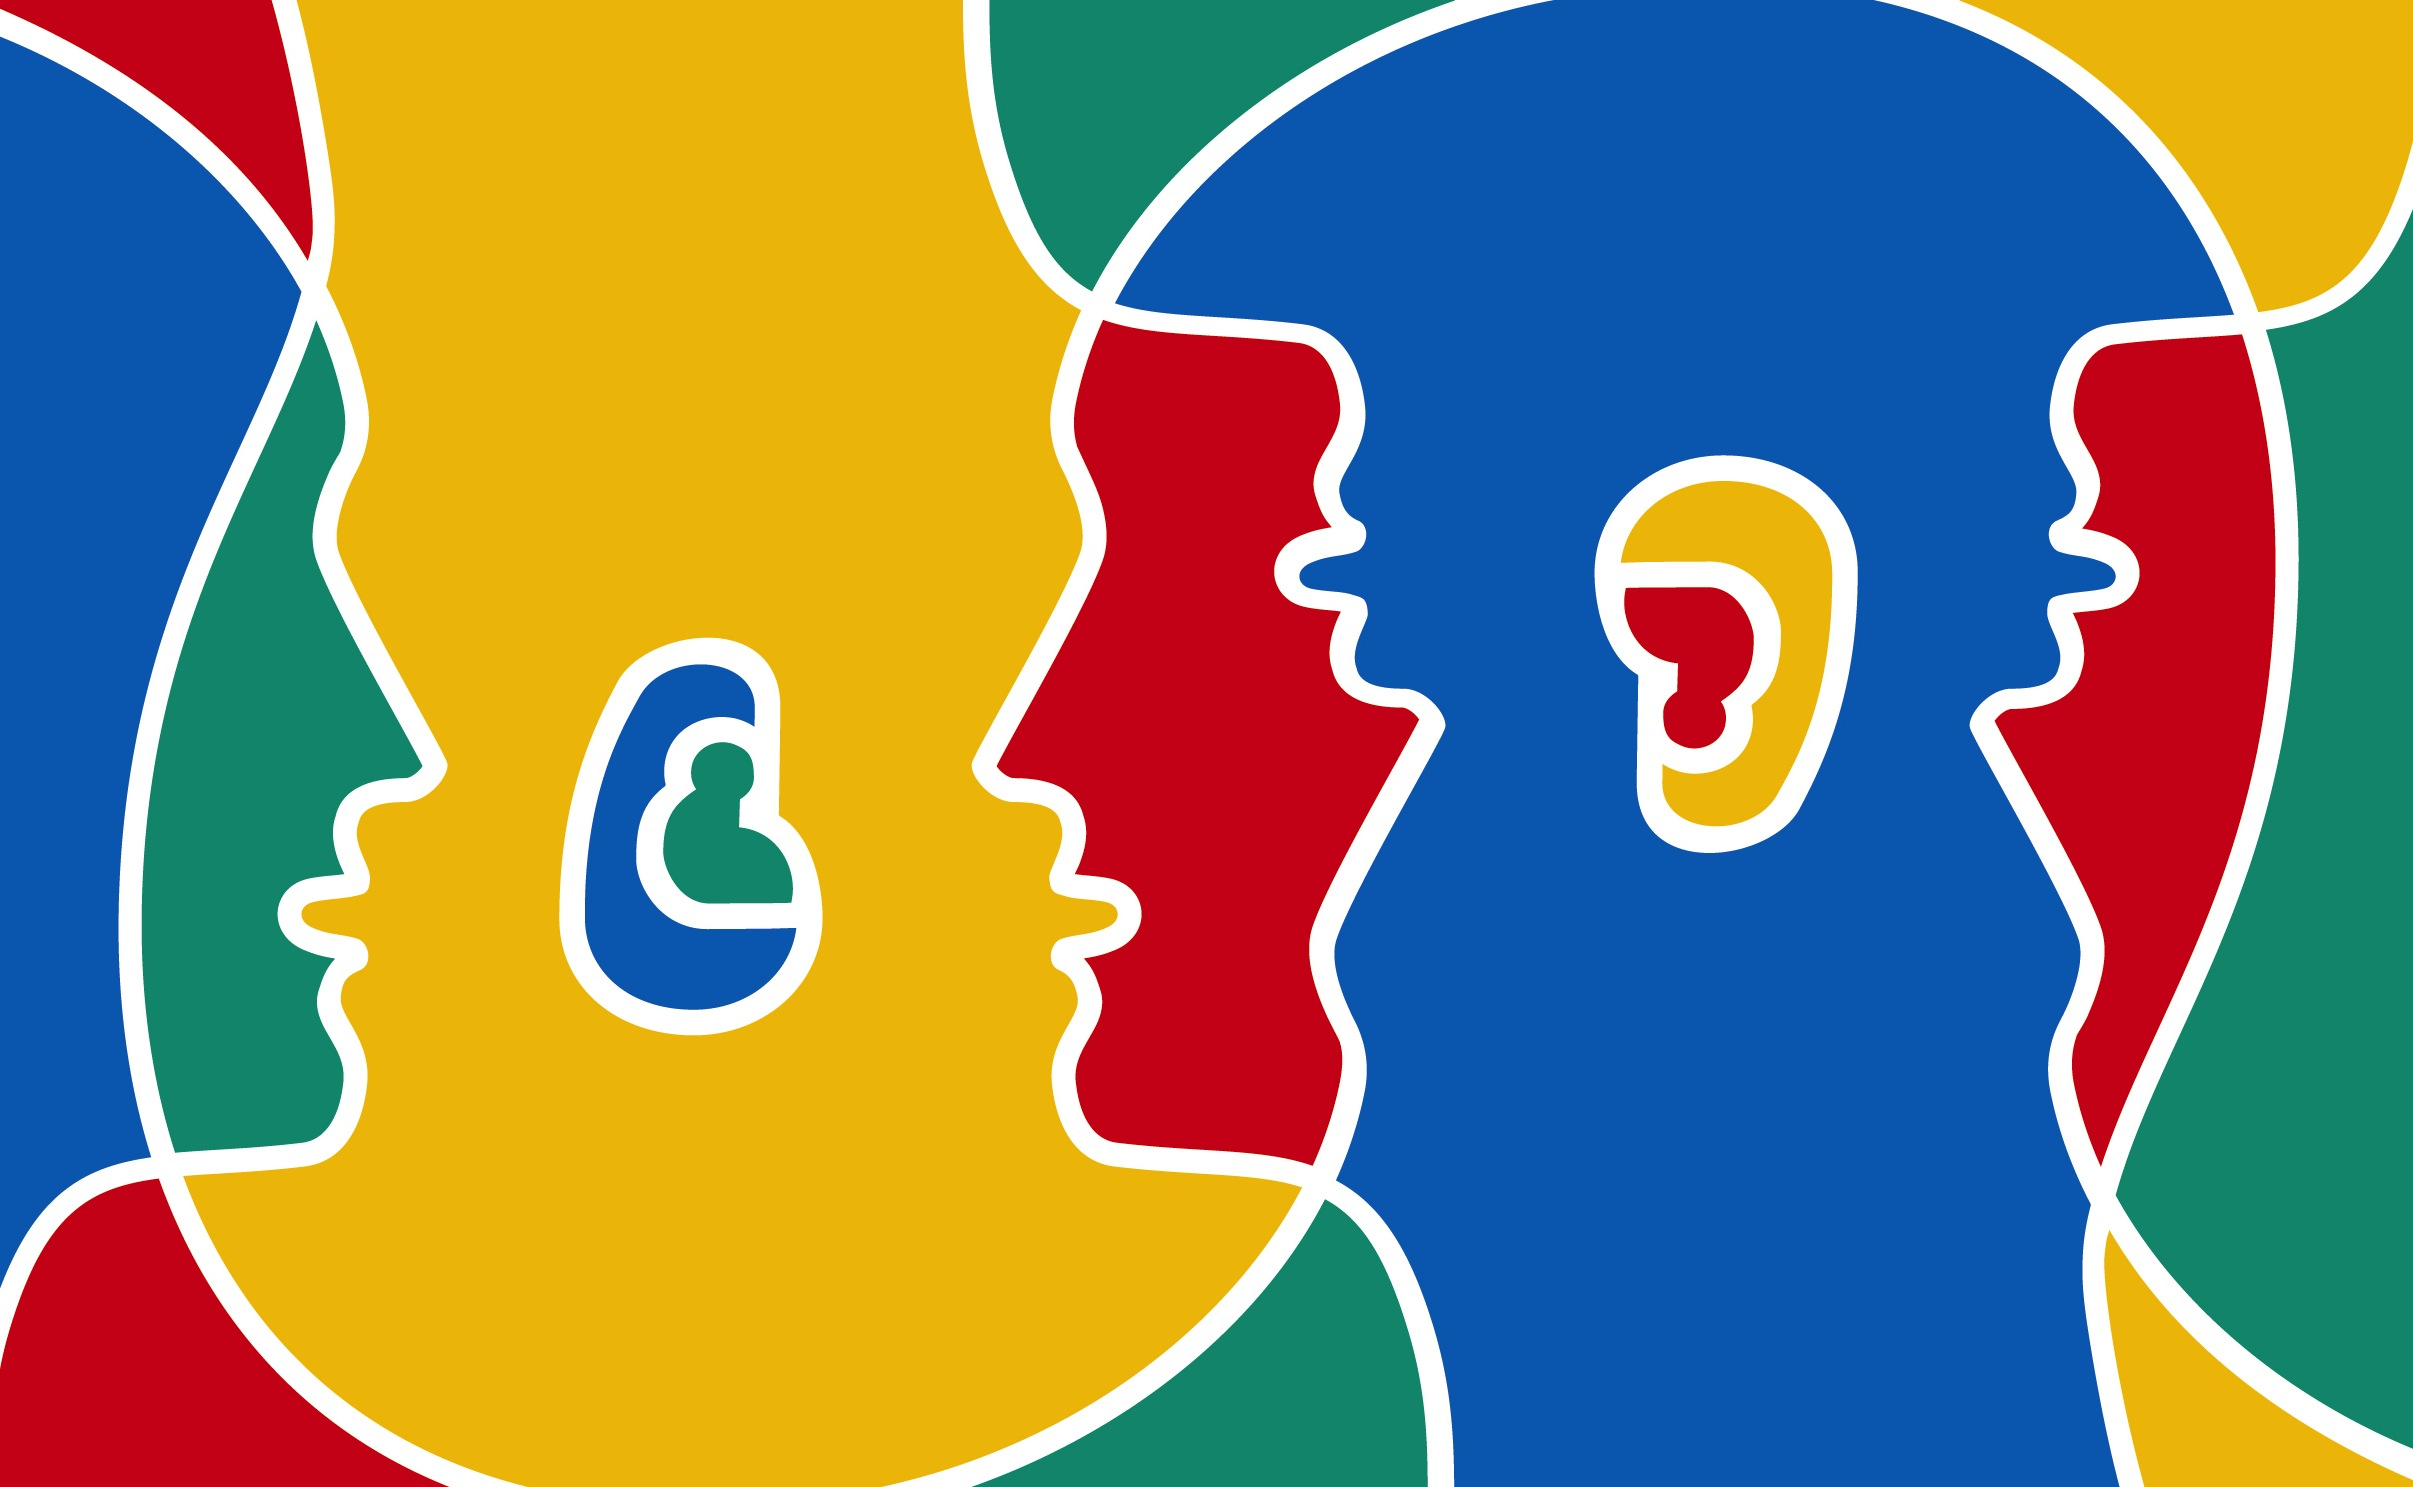 Il Natural Language Processing